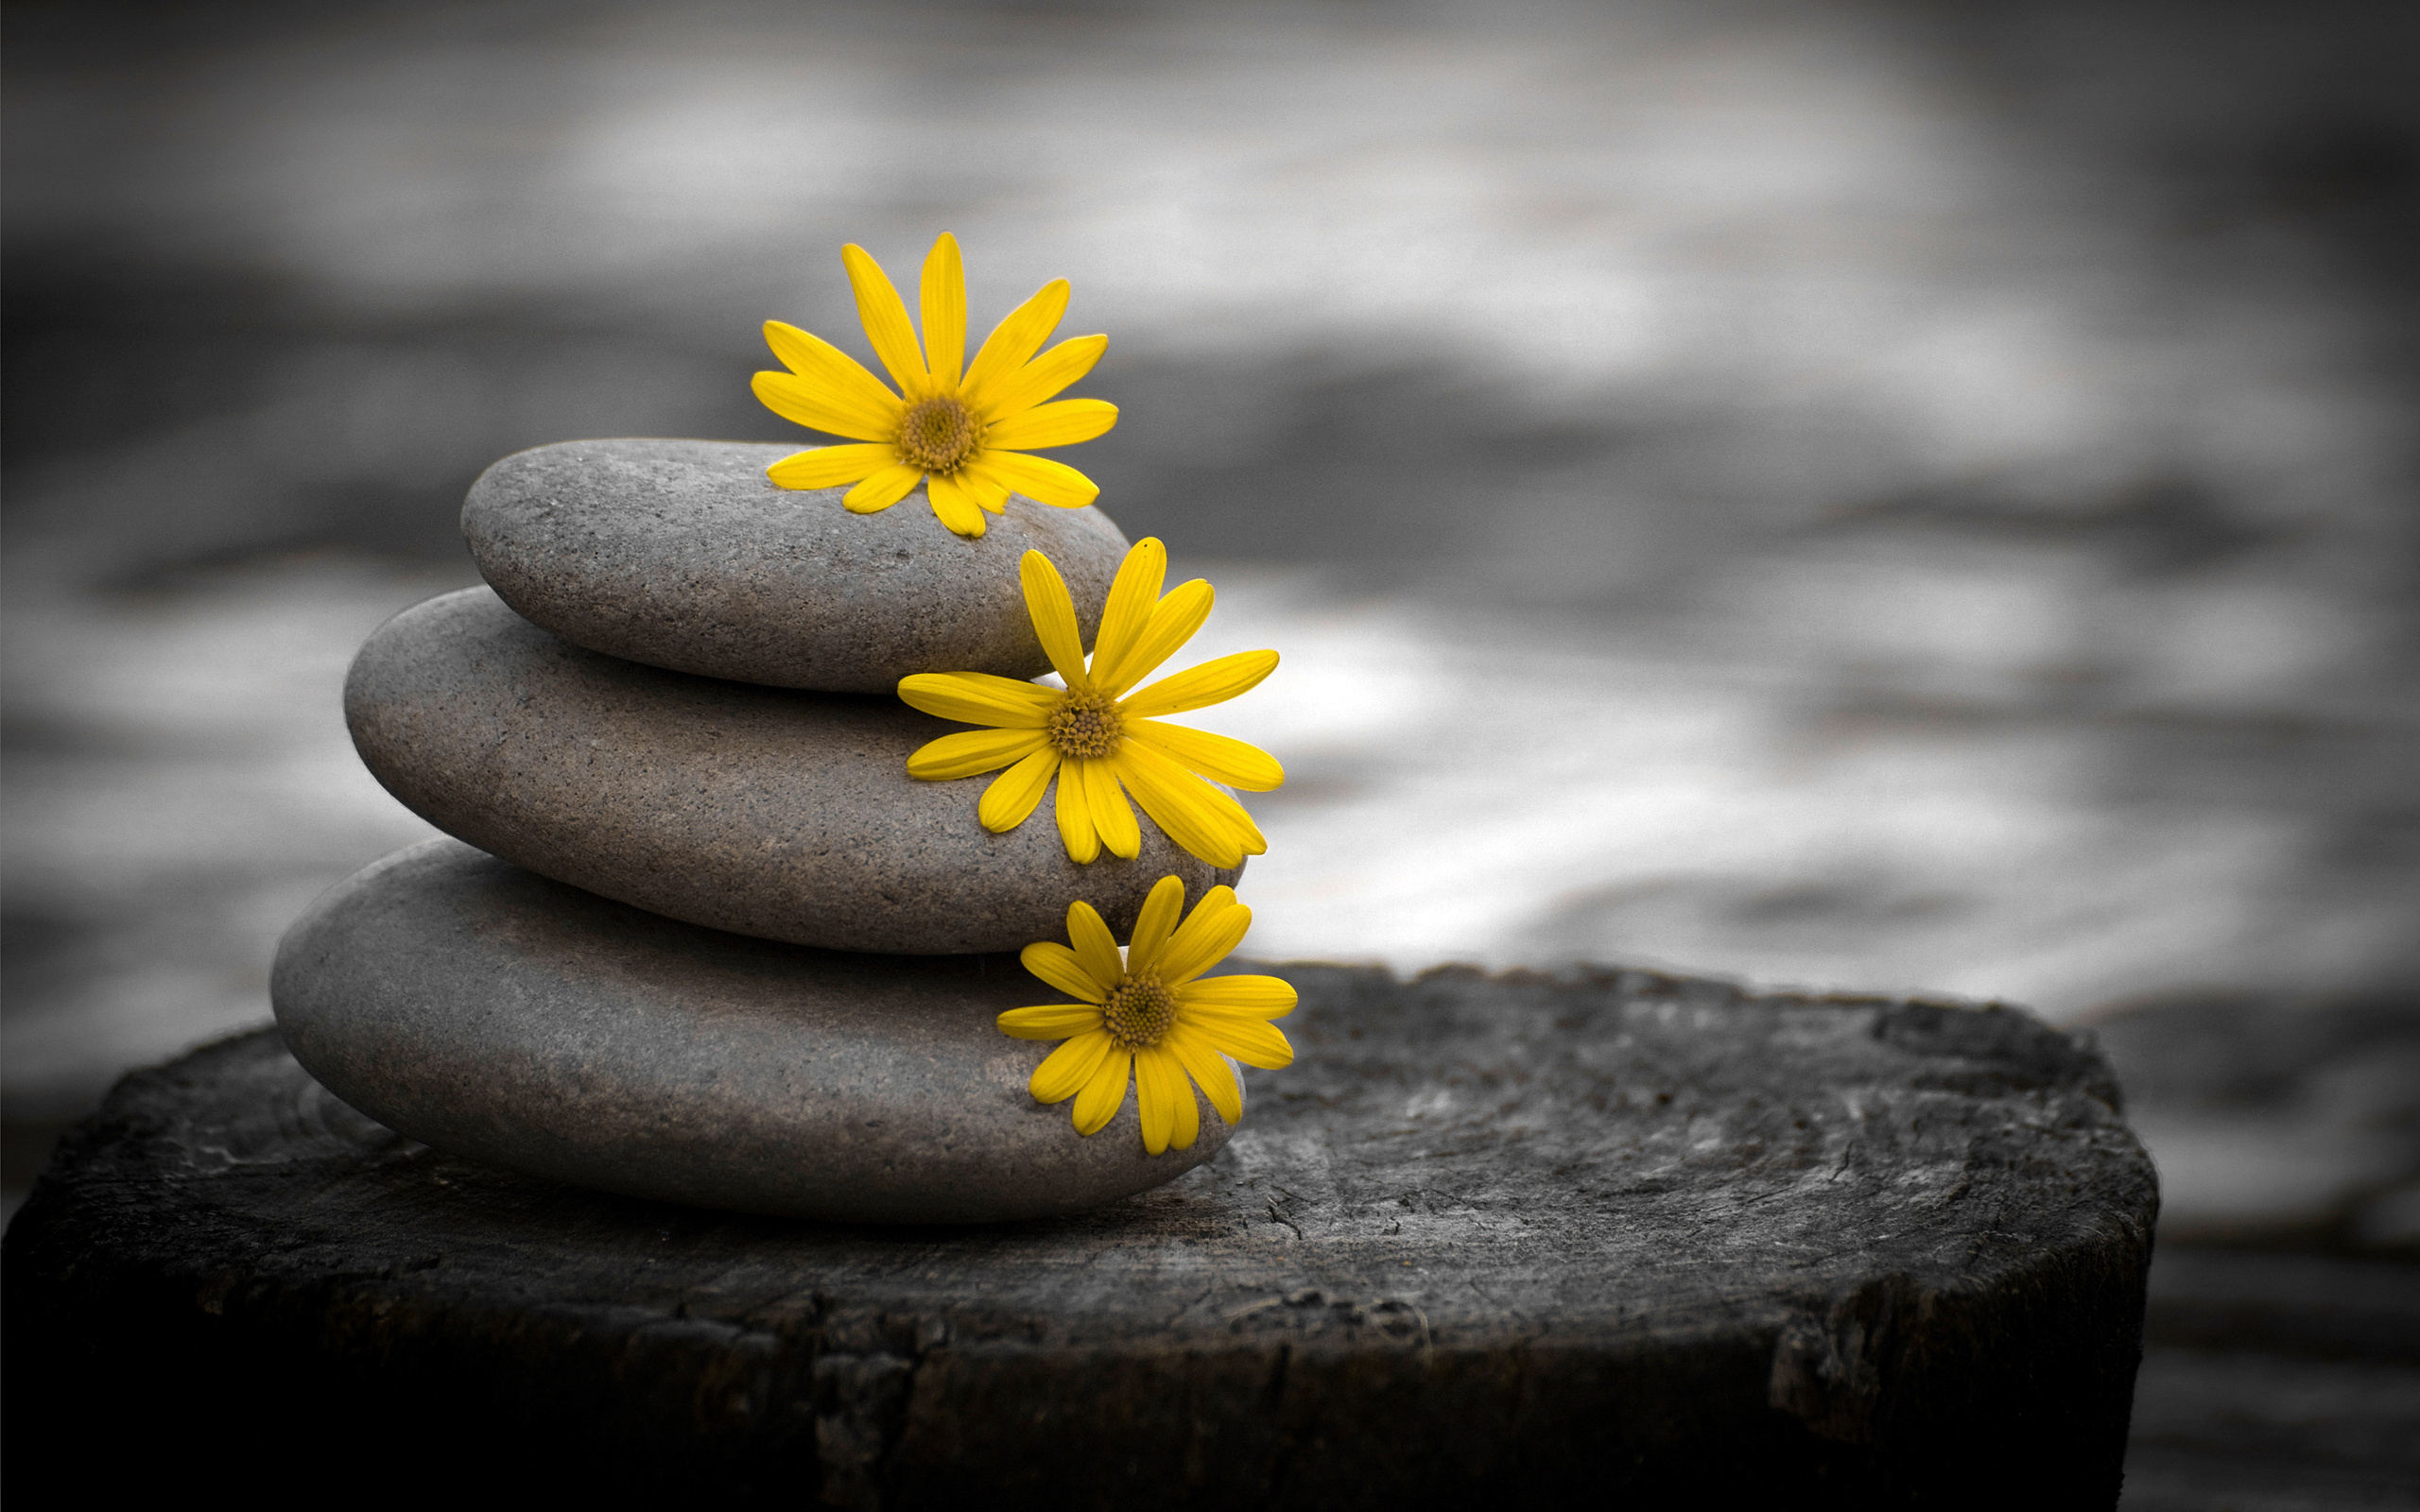 Цветы и камни картинки